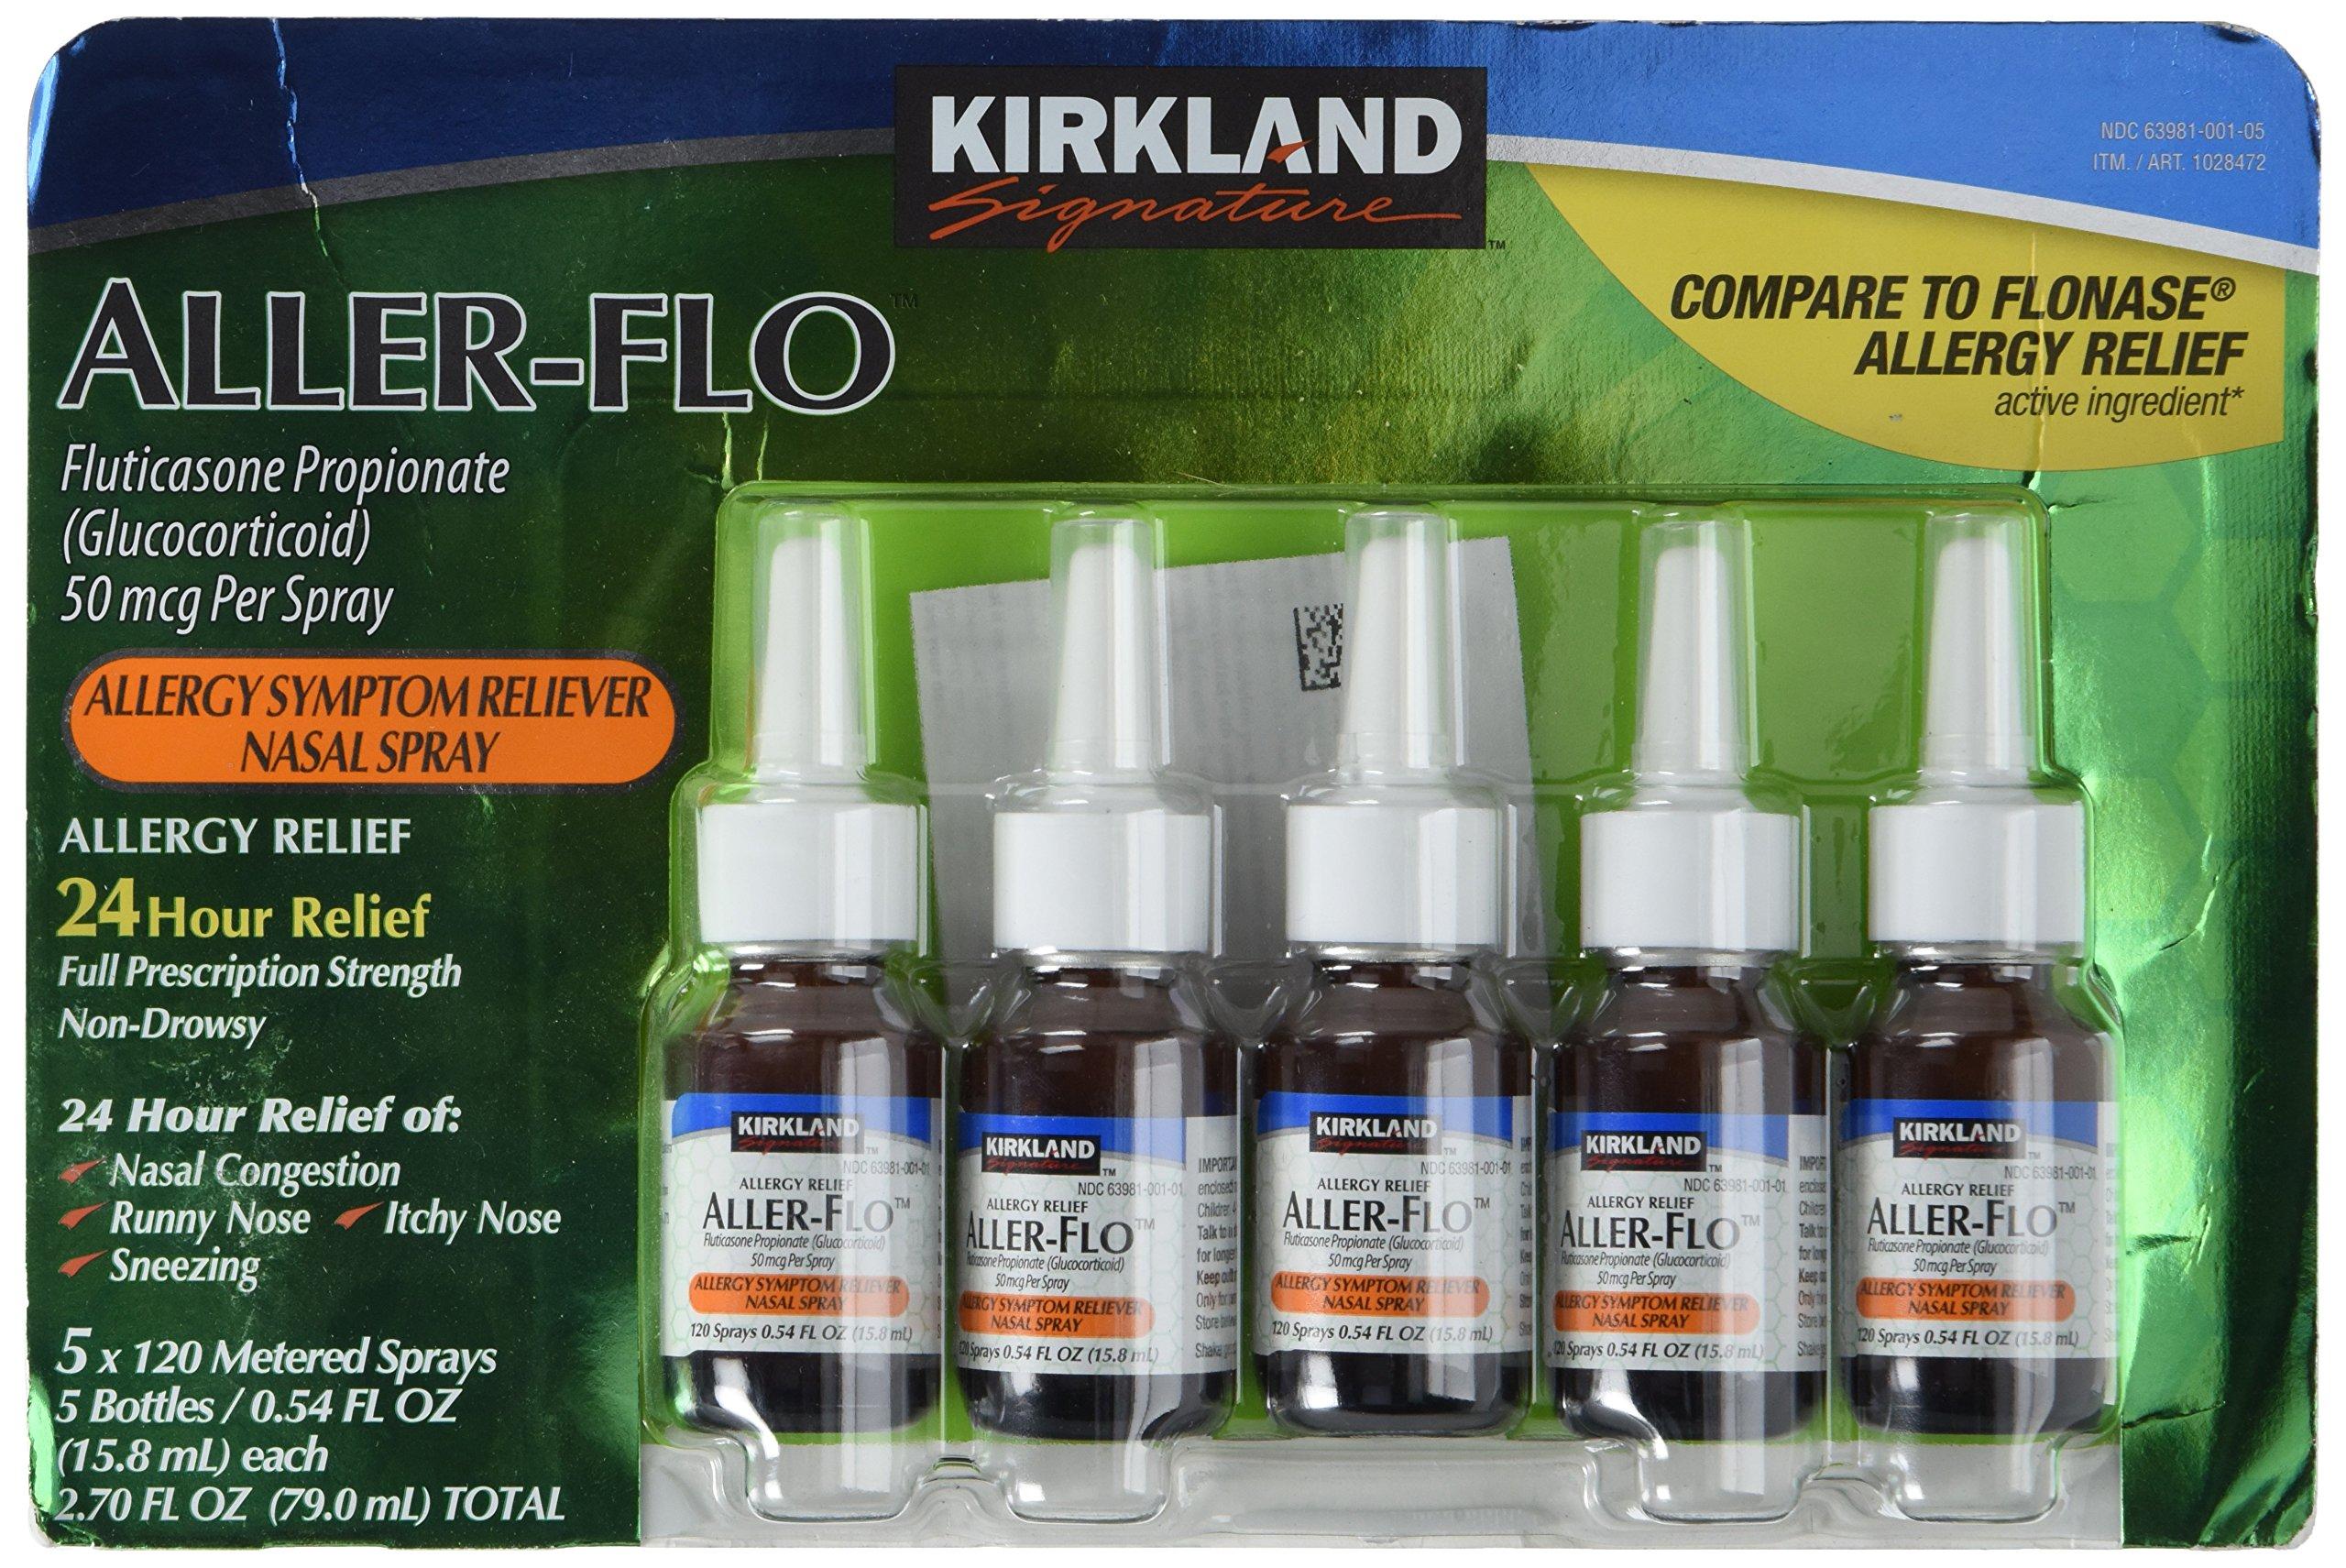 955d42a580a Kirkland Aller-Flo Fluticasone Propionate (Glucorticoid) 5 bottles x 120  Metered Sprays .54 Fl OZ per bottle (15.84 mL x 5) 2.70 OZ total (79.0 mL  total) ...